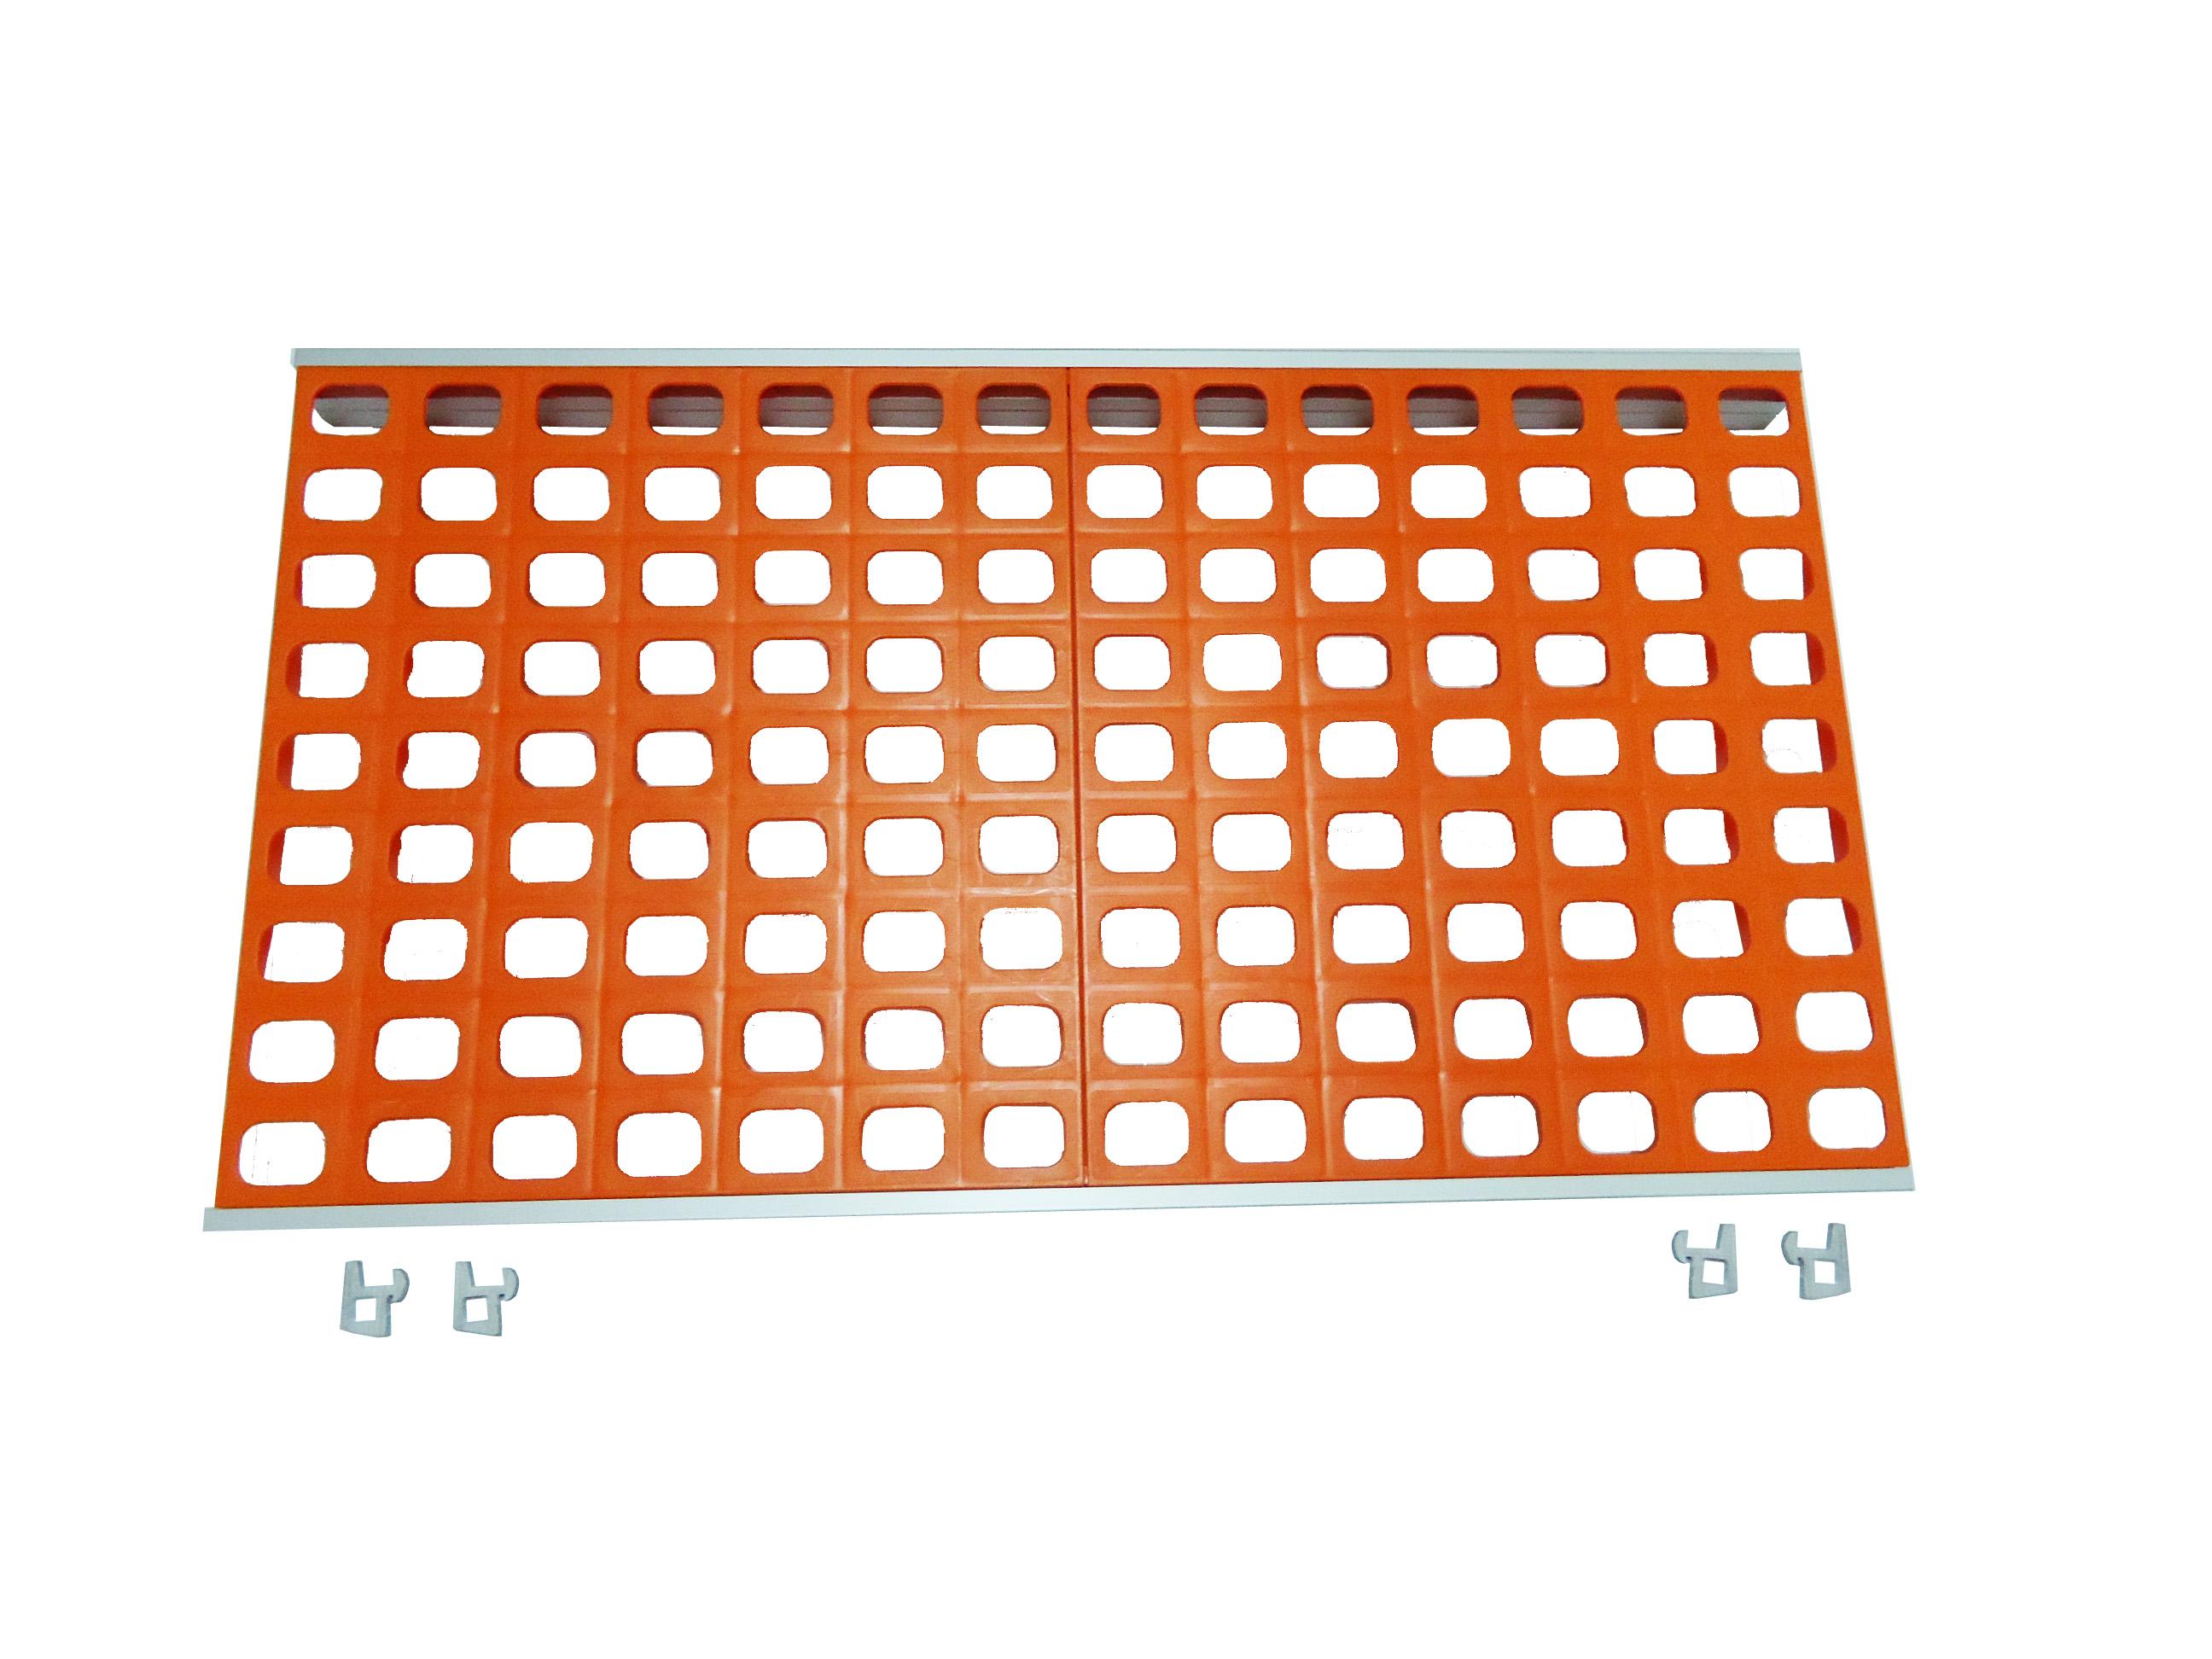 Coolblok KOPA47130C Ραφιέρα - Ράφι Ψυκτικών Θαλάμων Μονό Πολυαιθυλενίου - 1300x4 ψυκτικοί θάλαμοι    ράφια ψυκτικών θαλάμων  ψυκτικοί θάλαμοι    ράφια ψυκτικών θ